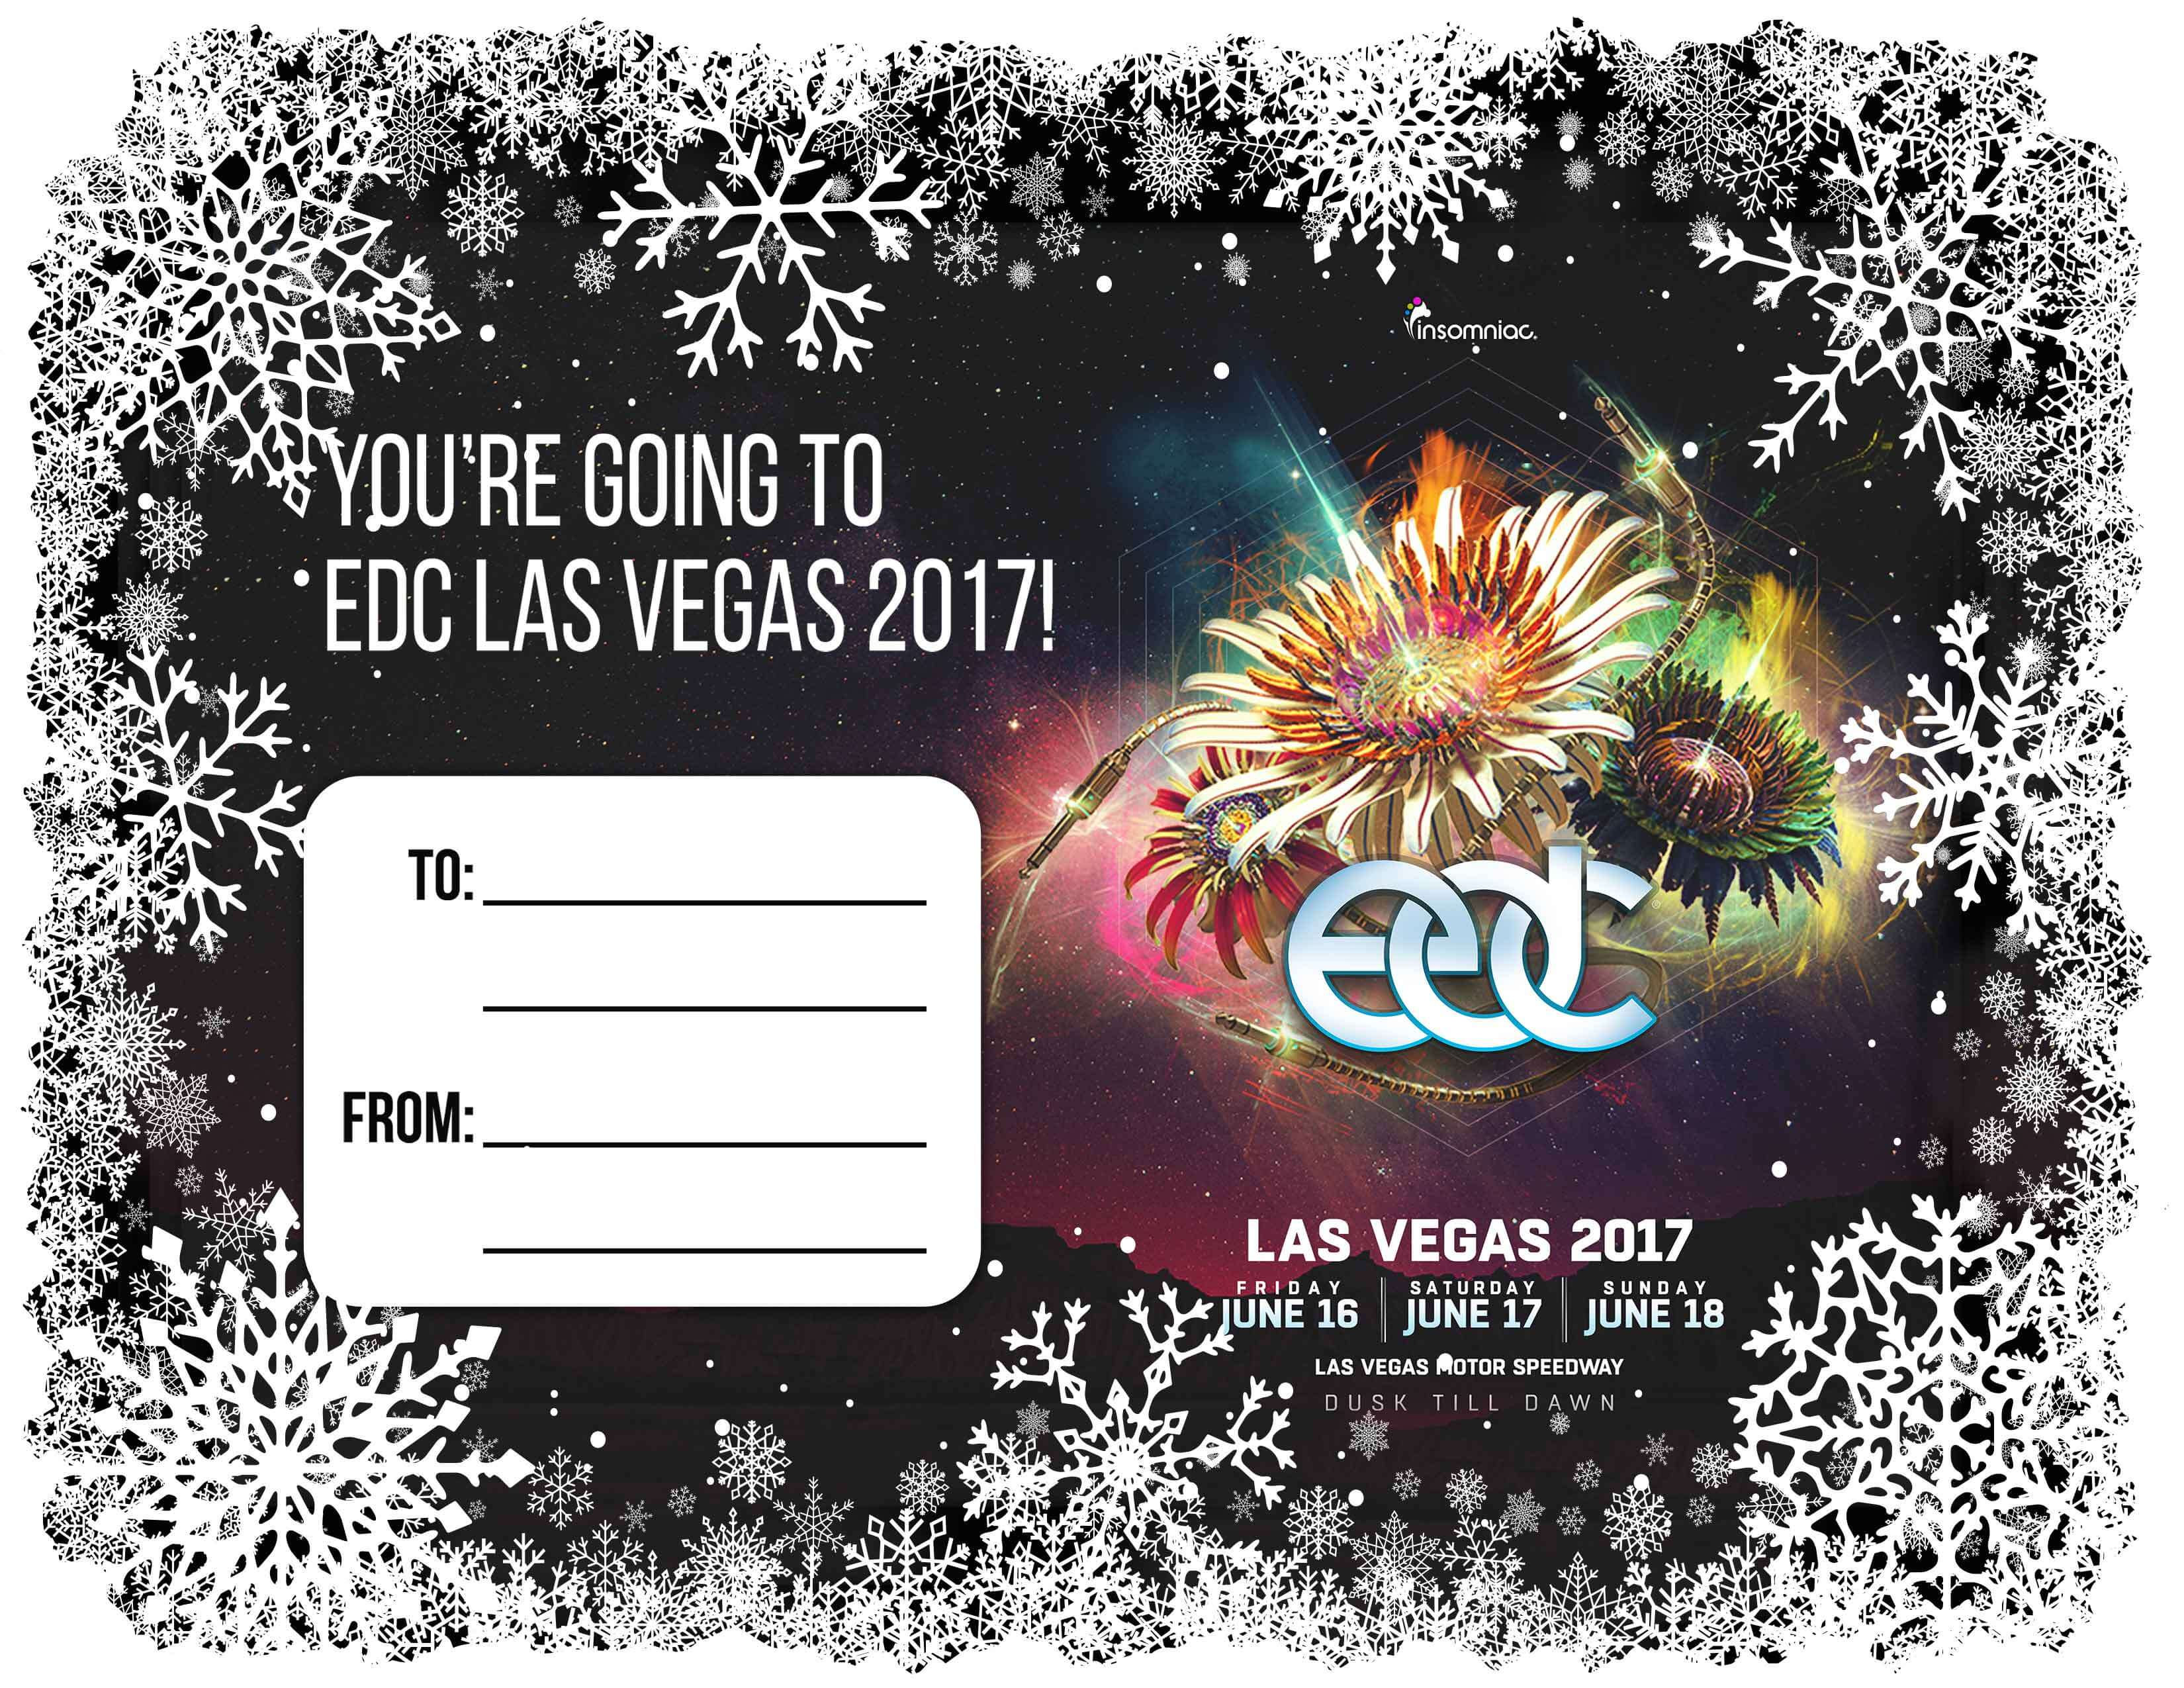 edc_las_vegas_holiday_show_certificate_8.5x11_r02_v3_WEB